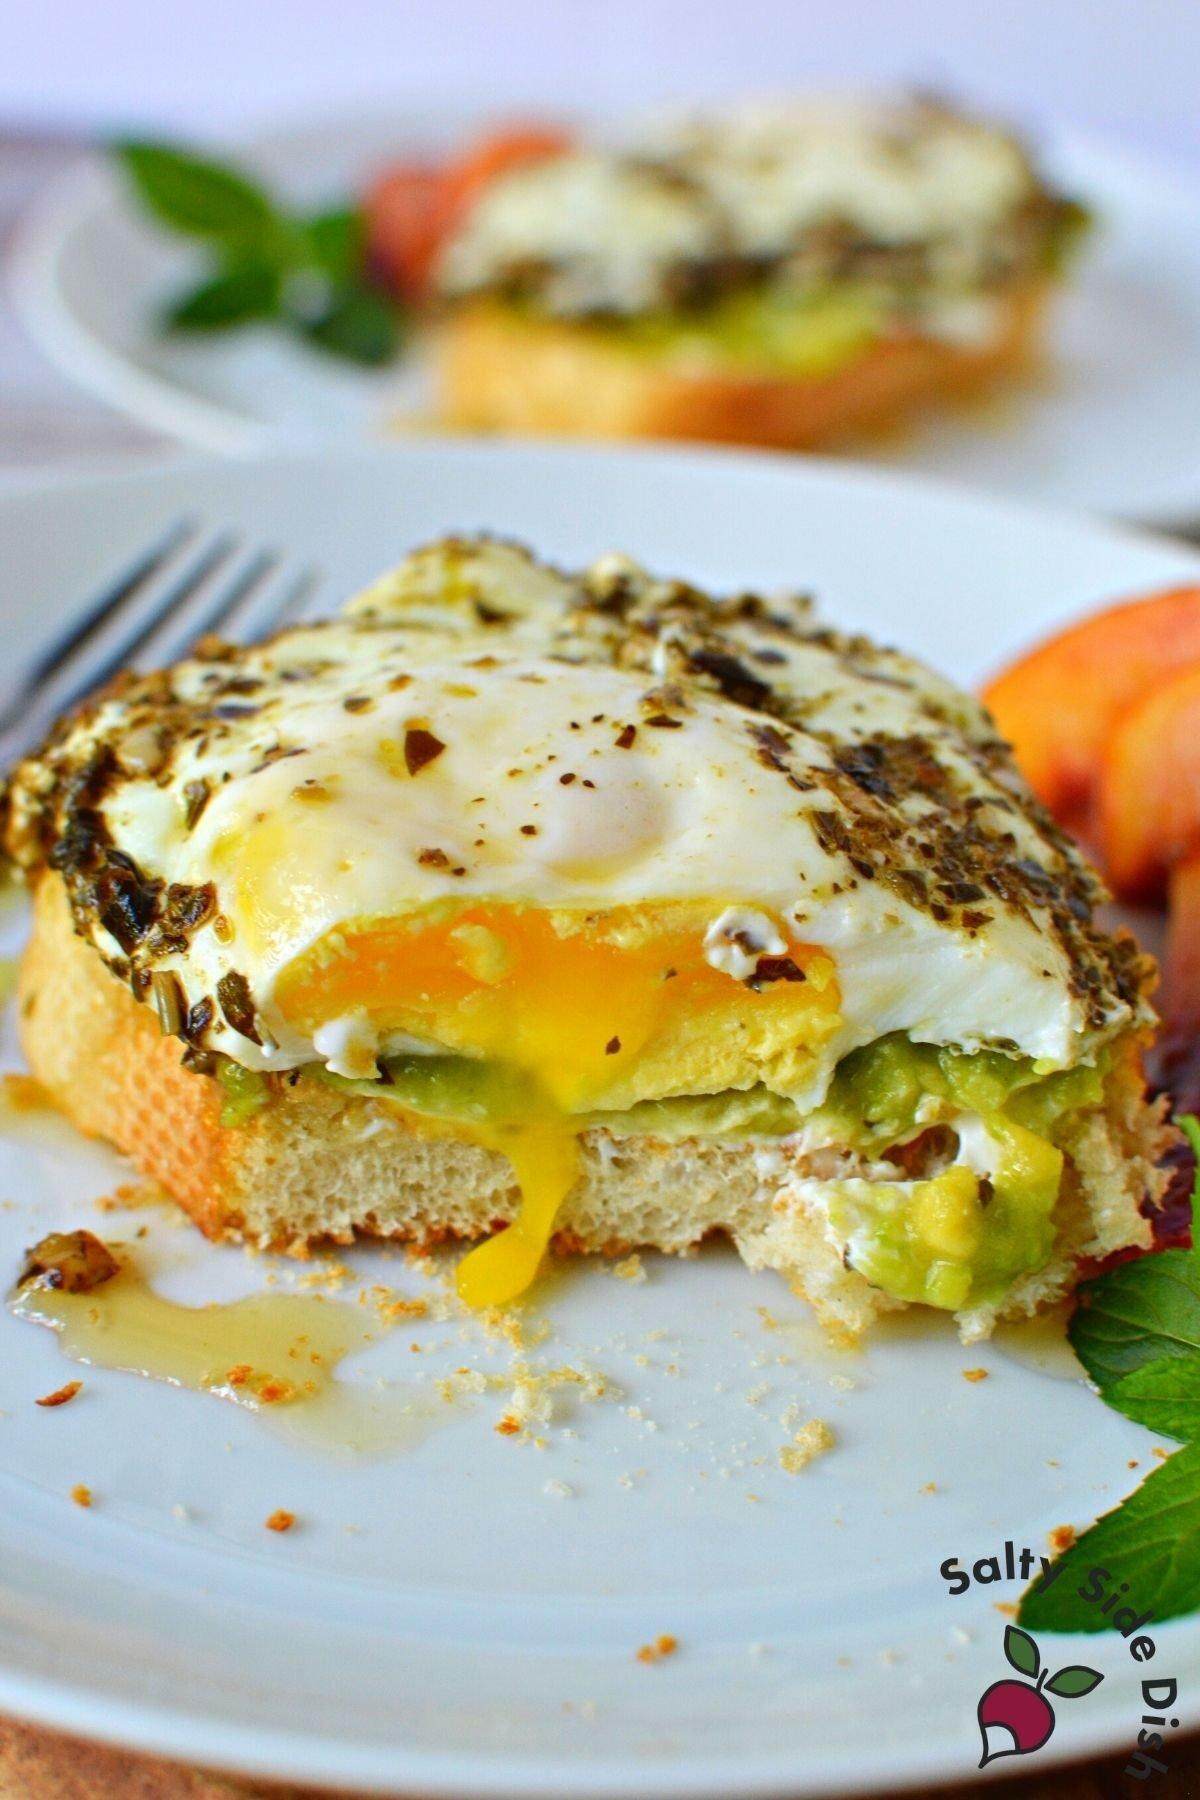 petso egg sandwich with honey.